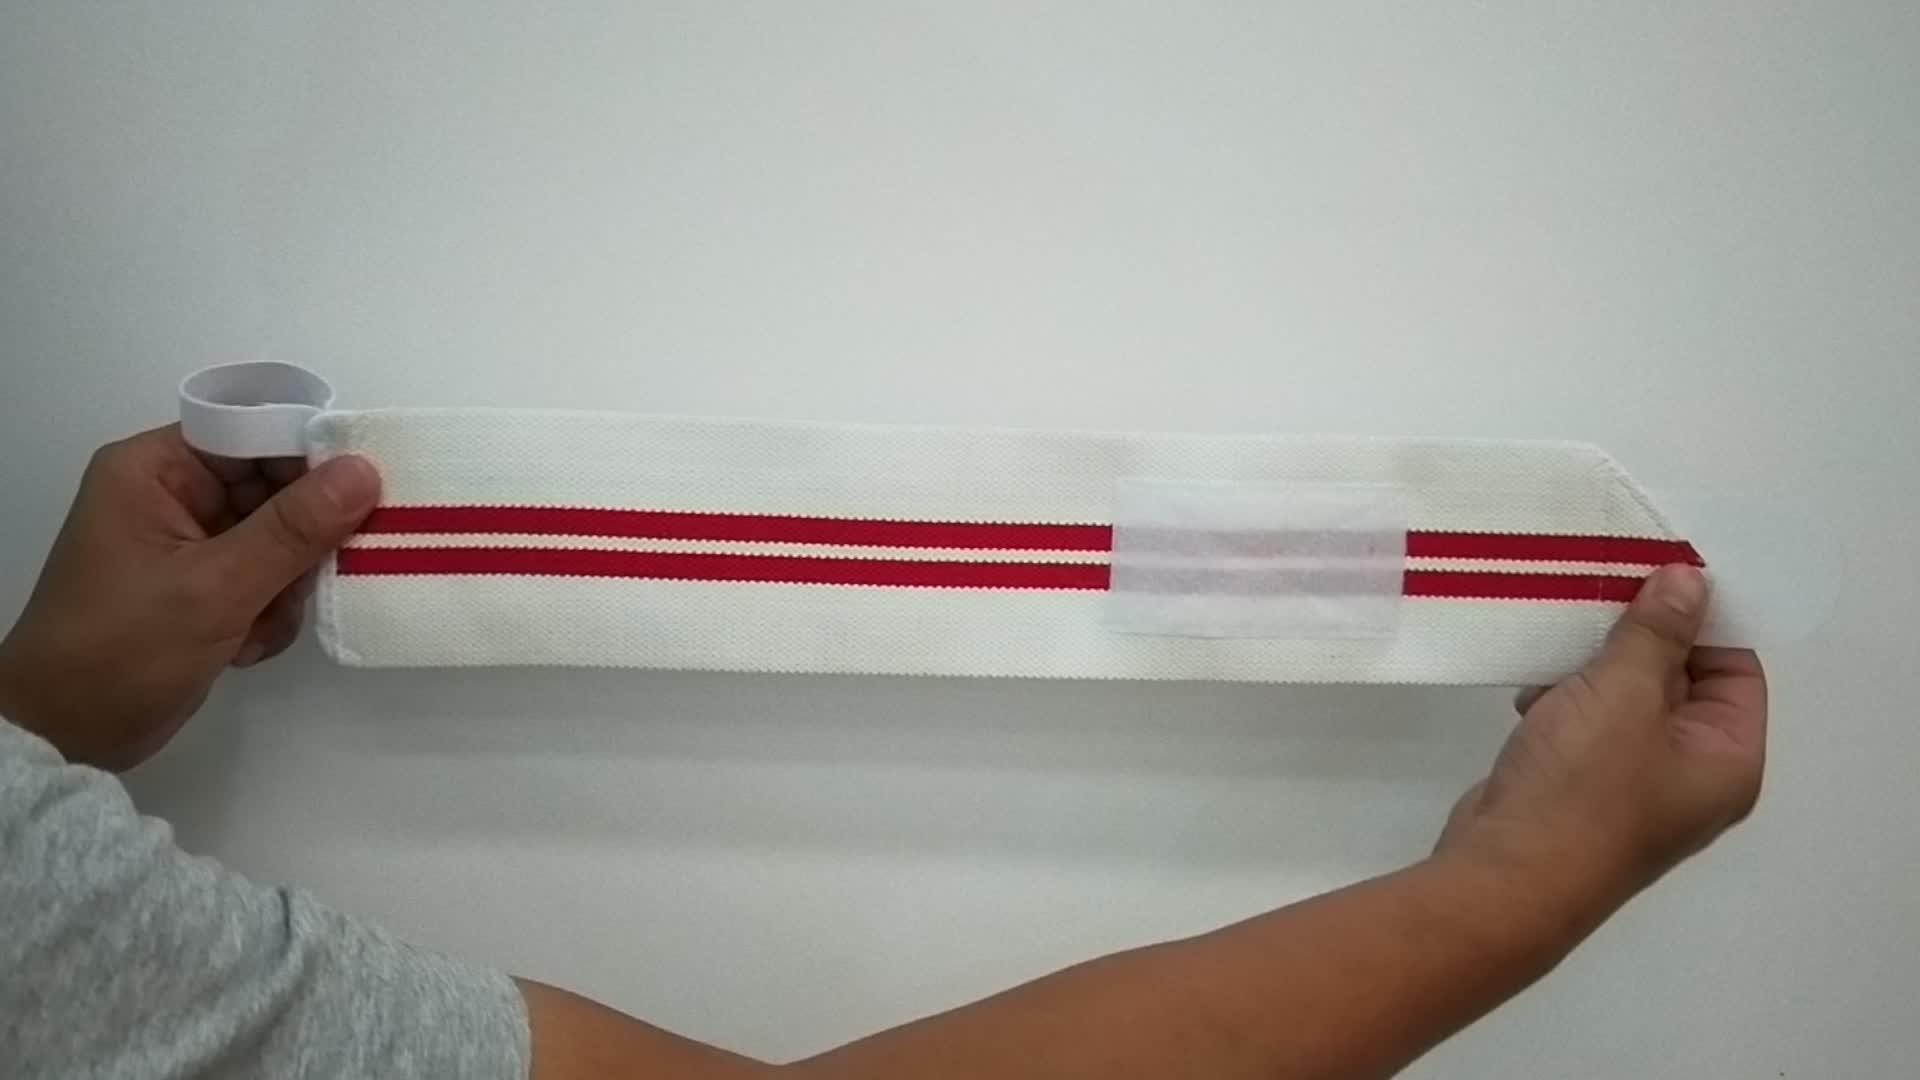 Weight Lifting Adjustable Wrist Wraps training, OEM Wrist Support wraps